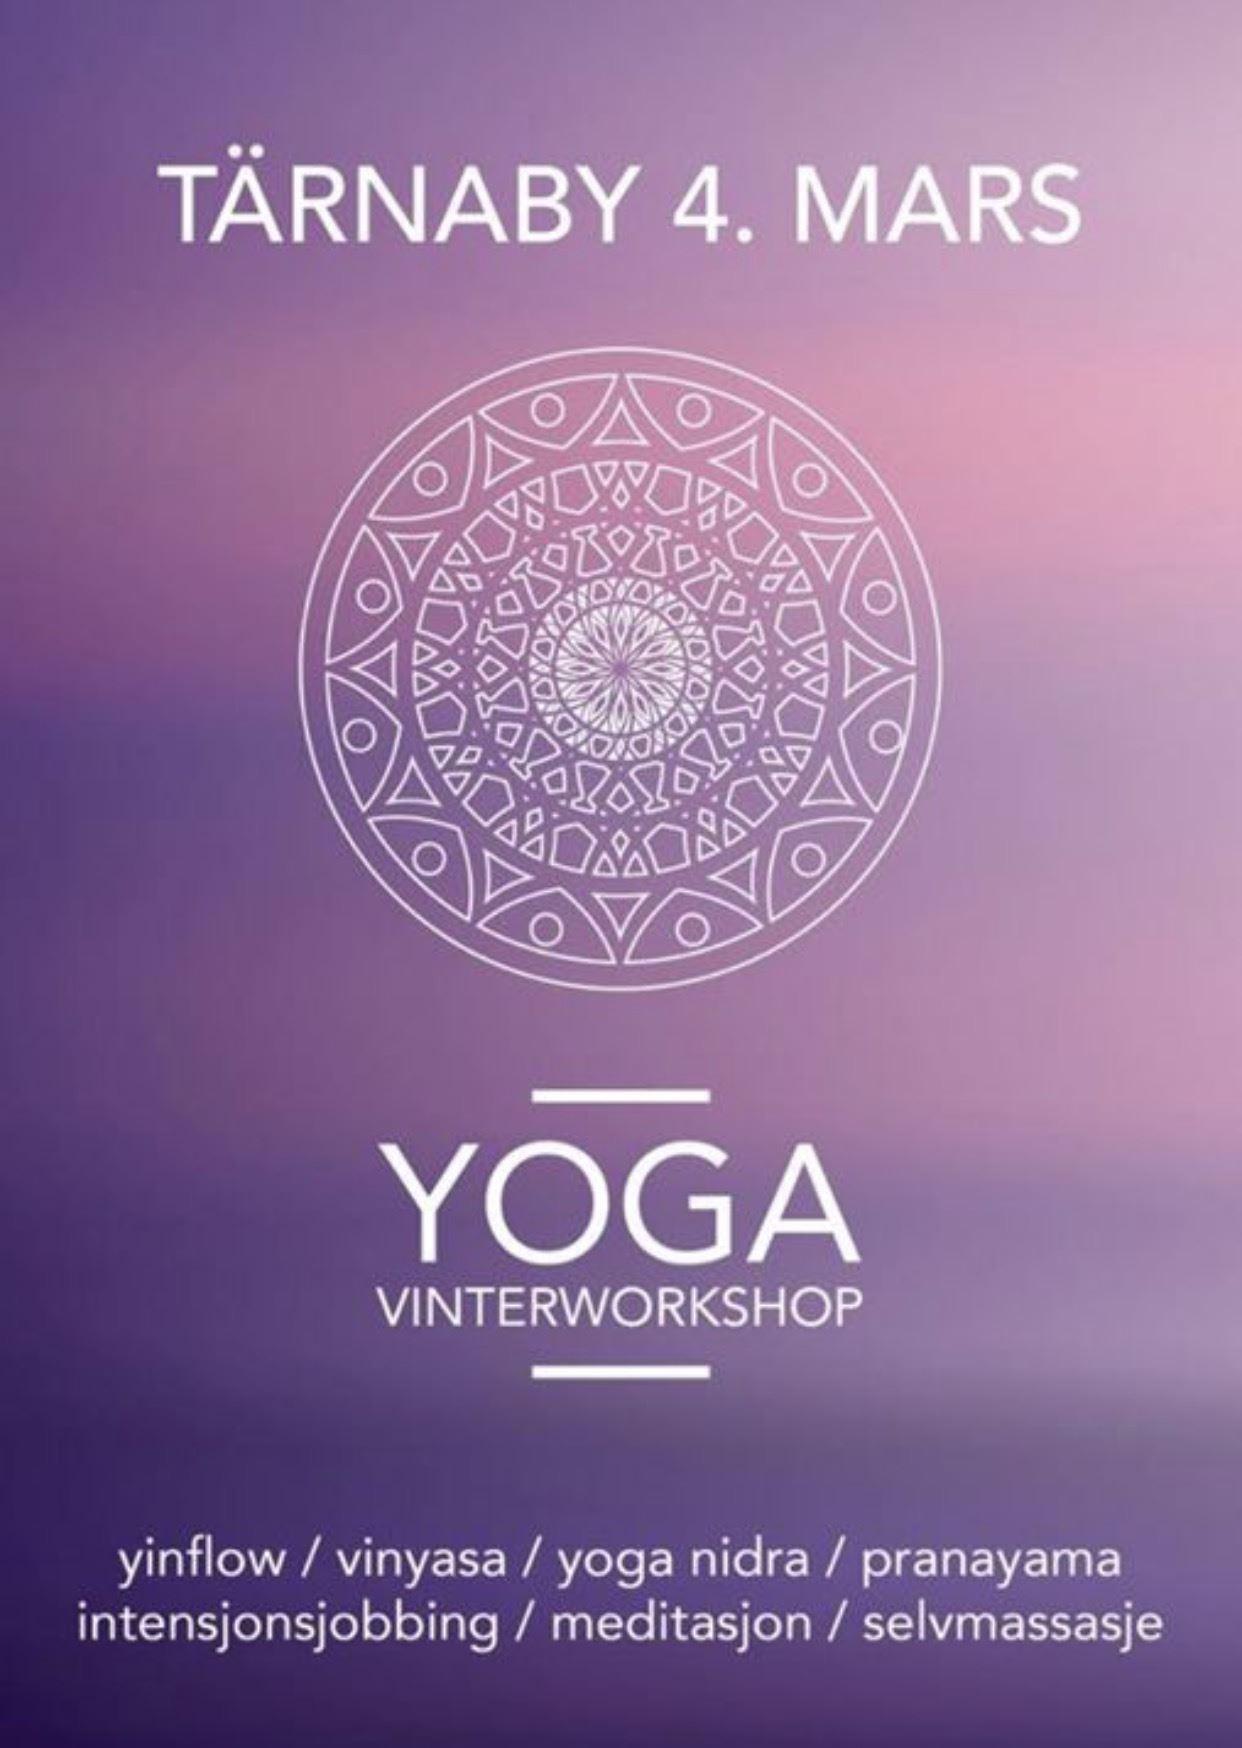 Yoga winter workshop